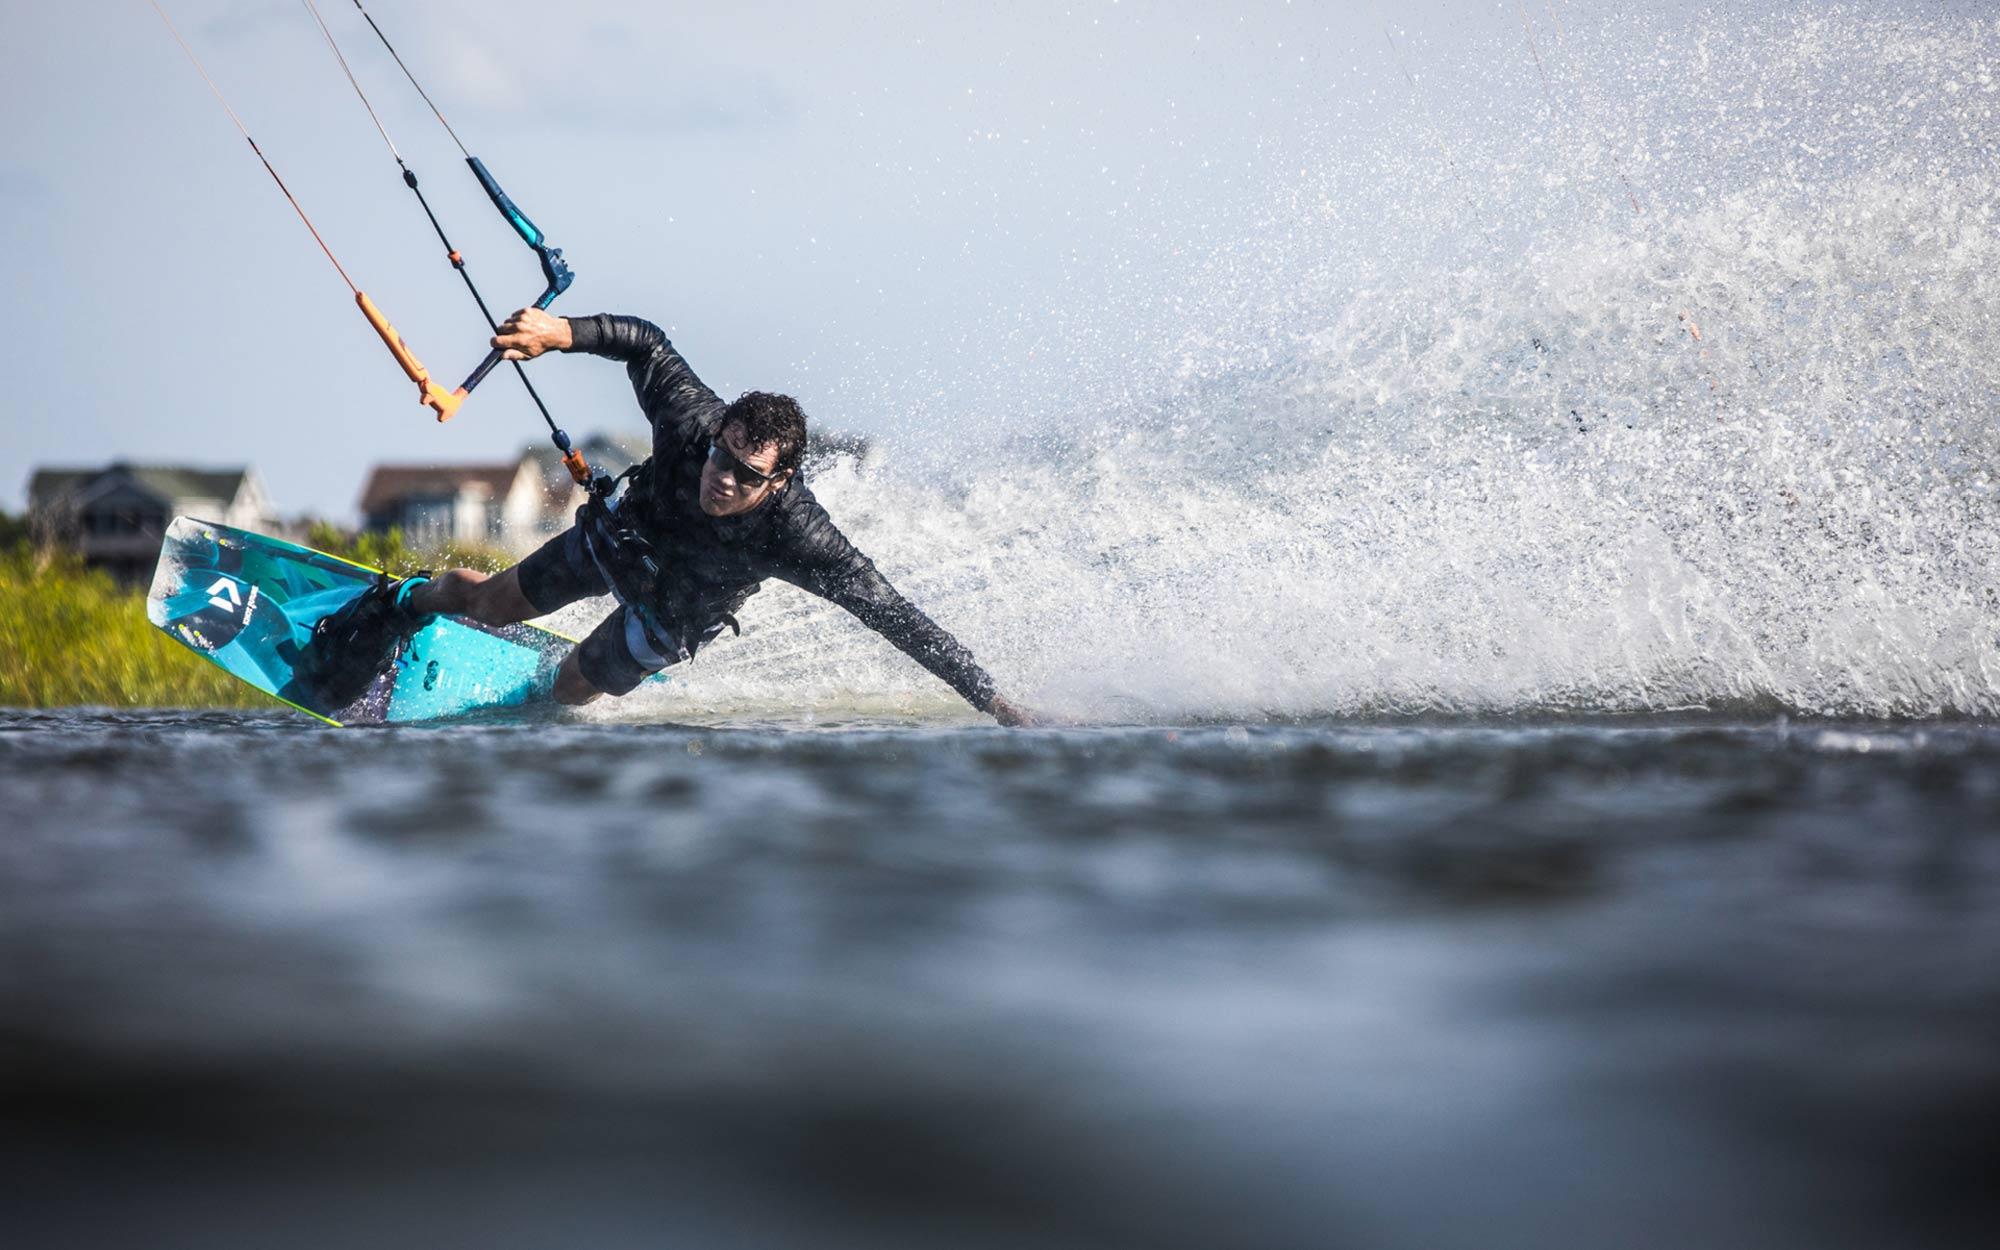 Duotone-Kiteboarding-2021-Twintips-SLS-SELECT-SOLEIL-JAIME-SPIKE--entity-ergo-planche-de-kitesurf